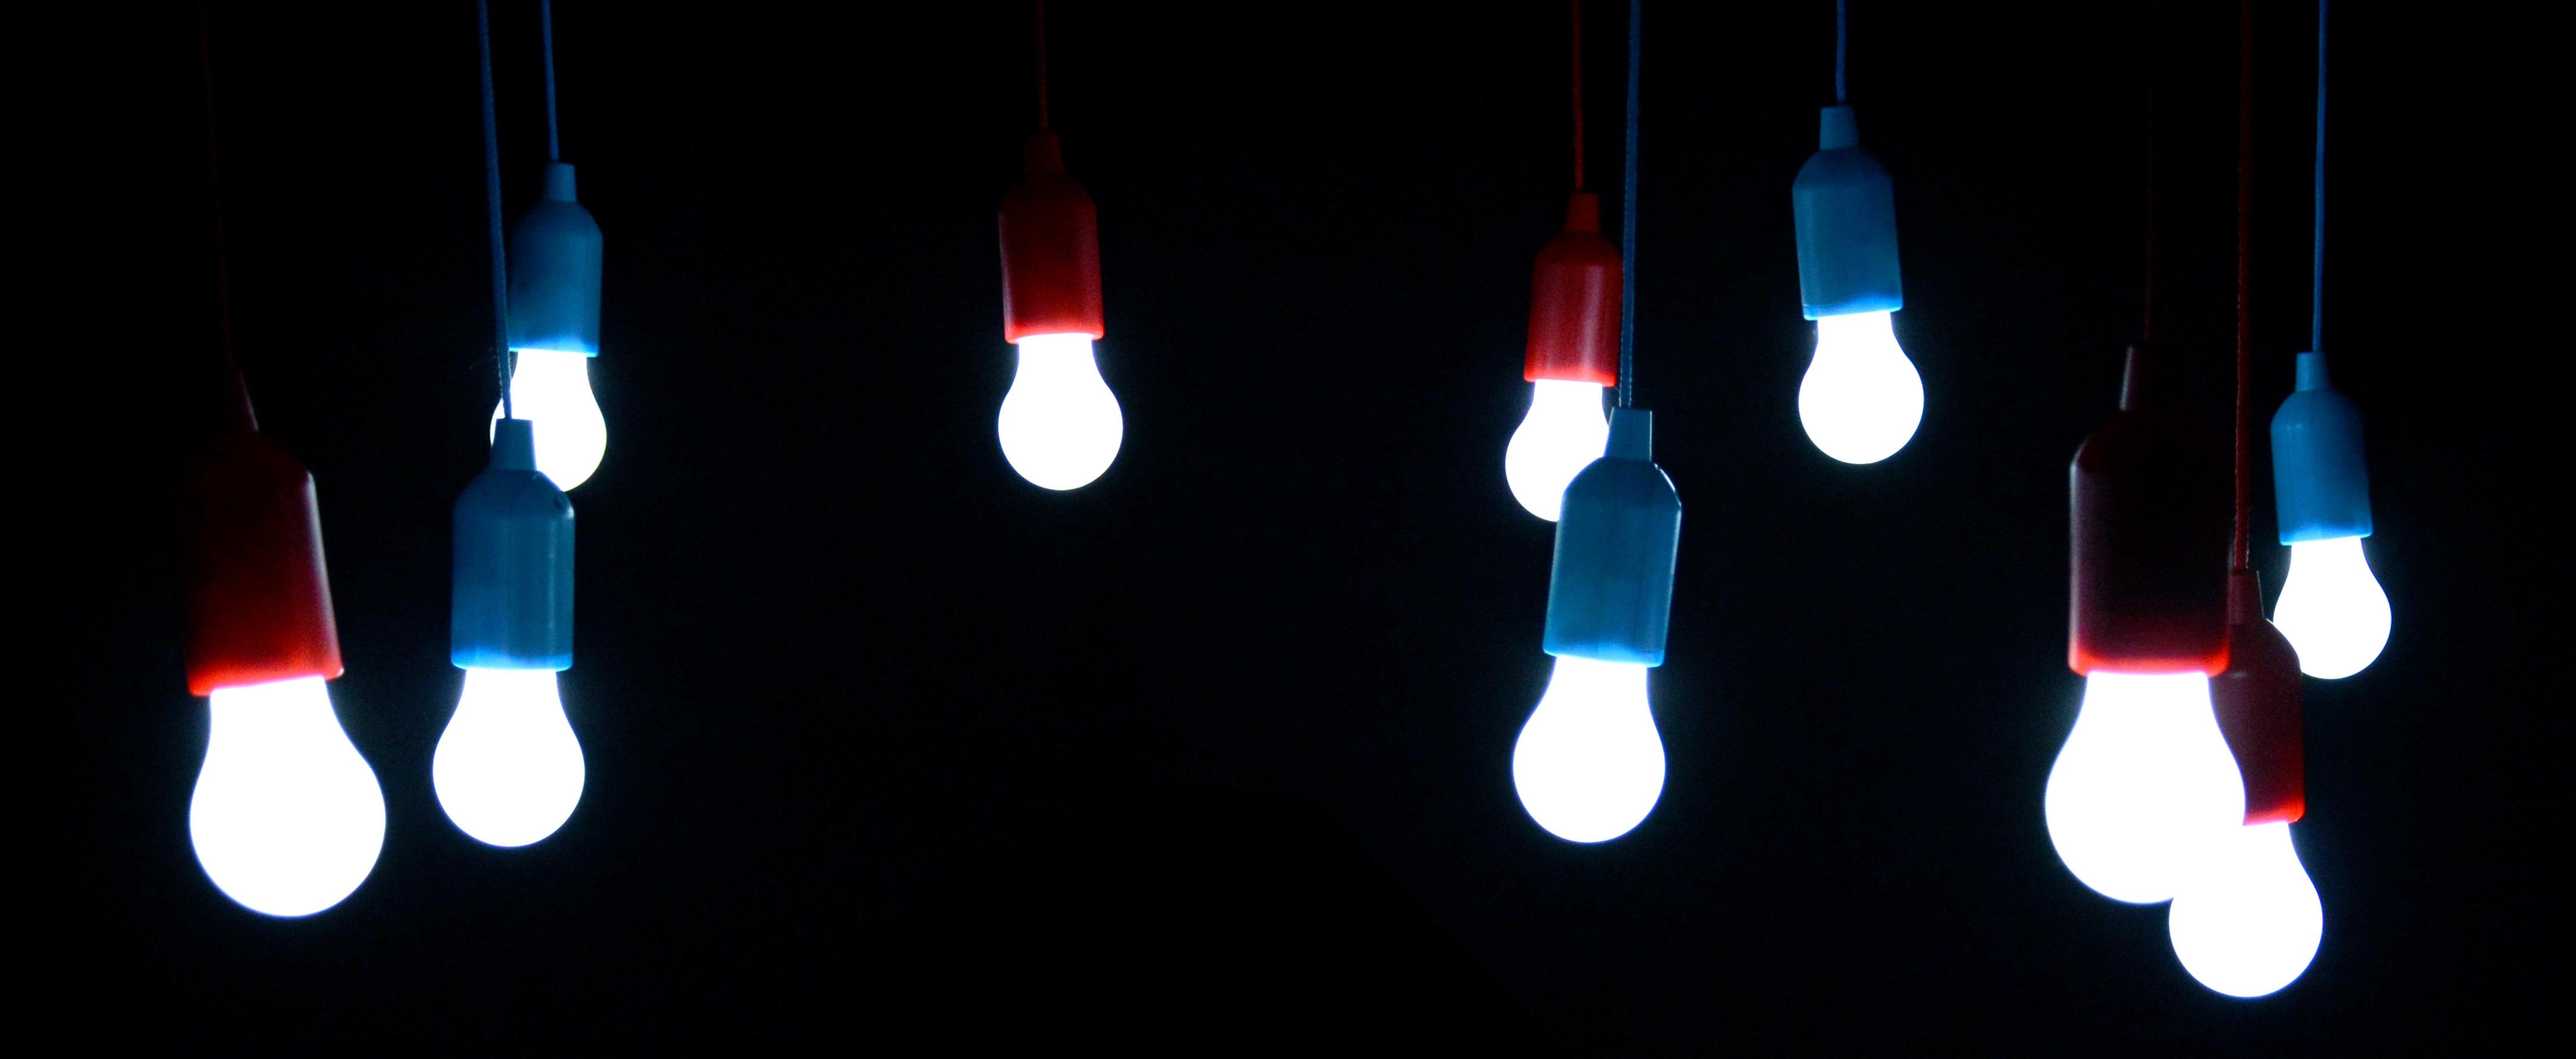 https://get.pxhere.com/photo/light-abstract-dark-glow-darkness-blue-electricity-light-bulb-pear-lighting-energy-current-lights-bulbs-lamps-light-fixture-led-light-bulbs-shed-light-incandescent-light-bulb-lamp-holders-1180205.jpg